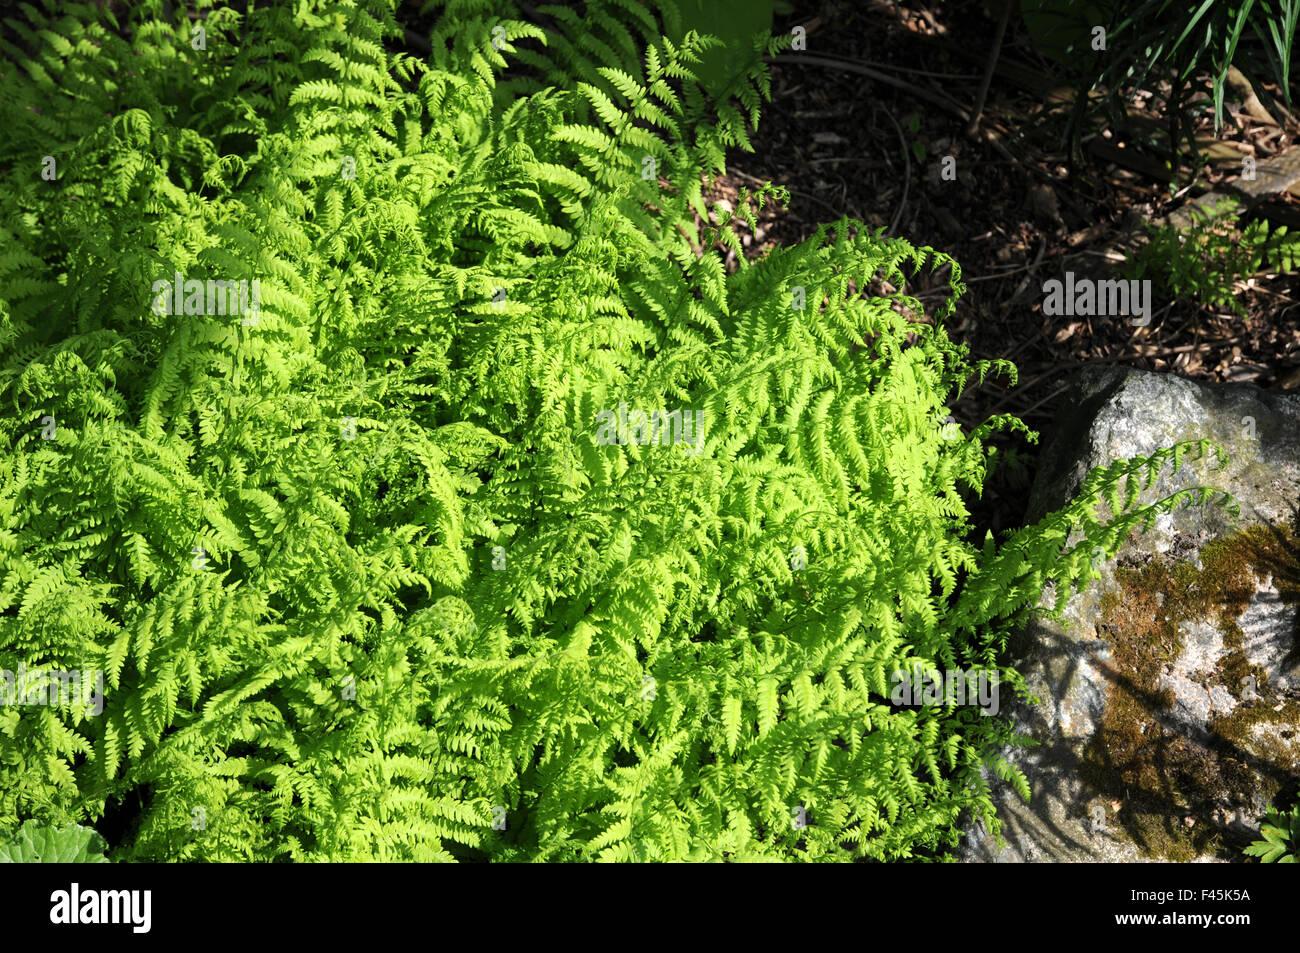 Eastern marsh fern Stock Photo